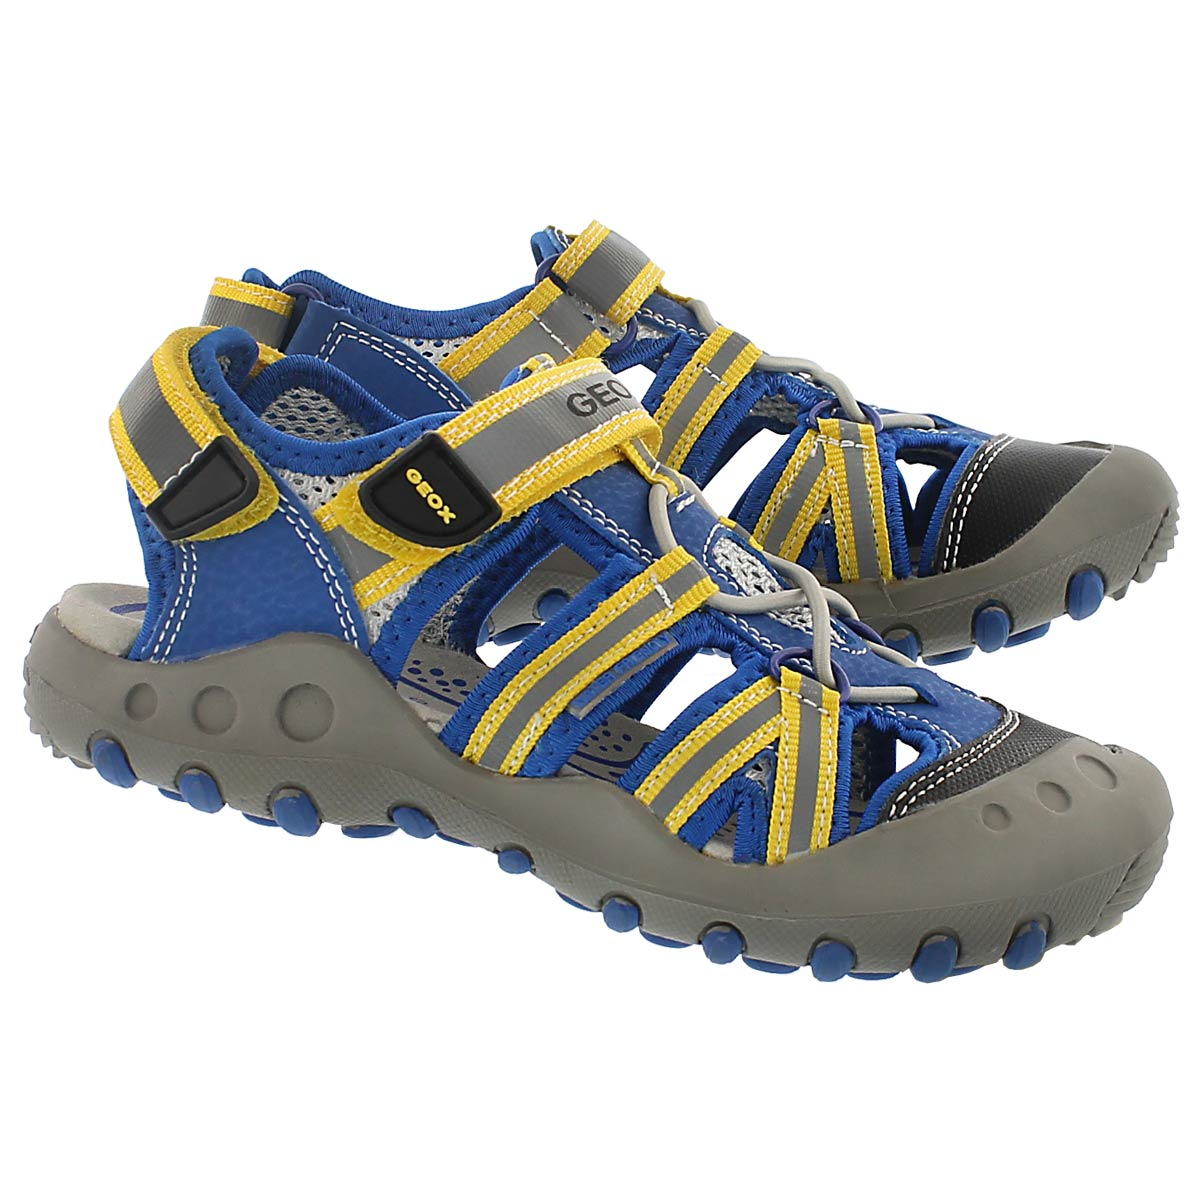 Bys Kyle blue/yellow fisherman sandal